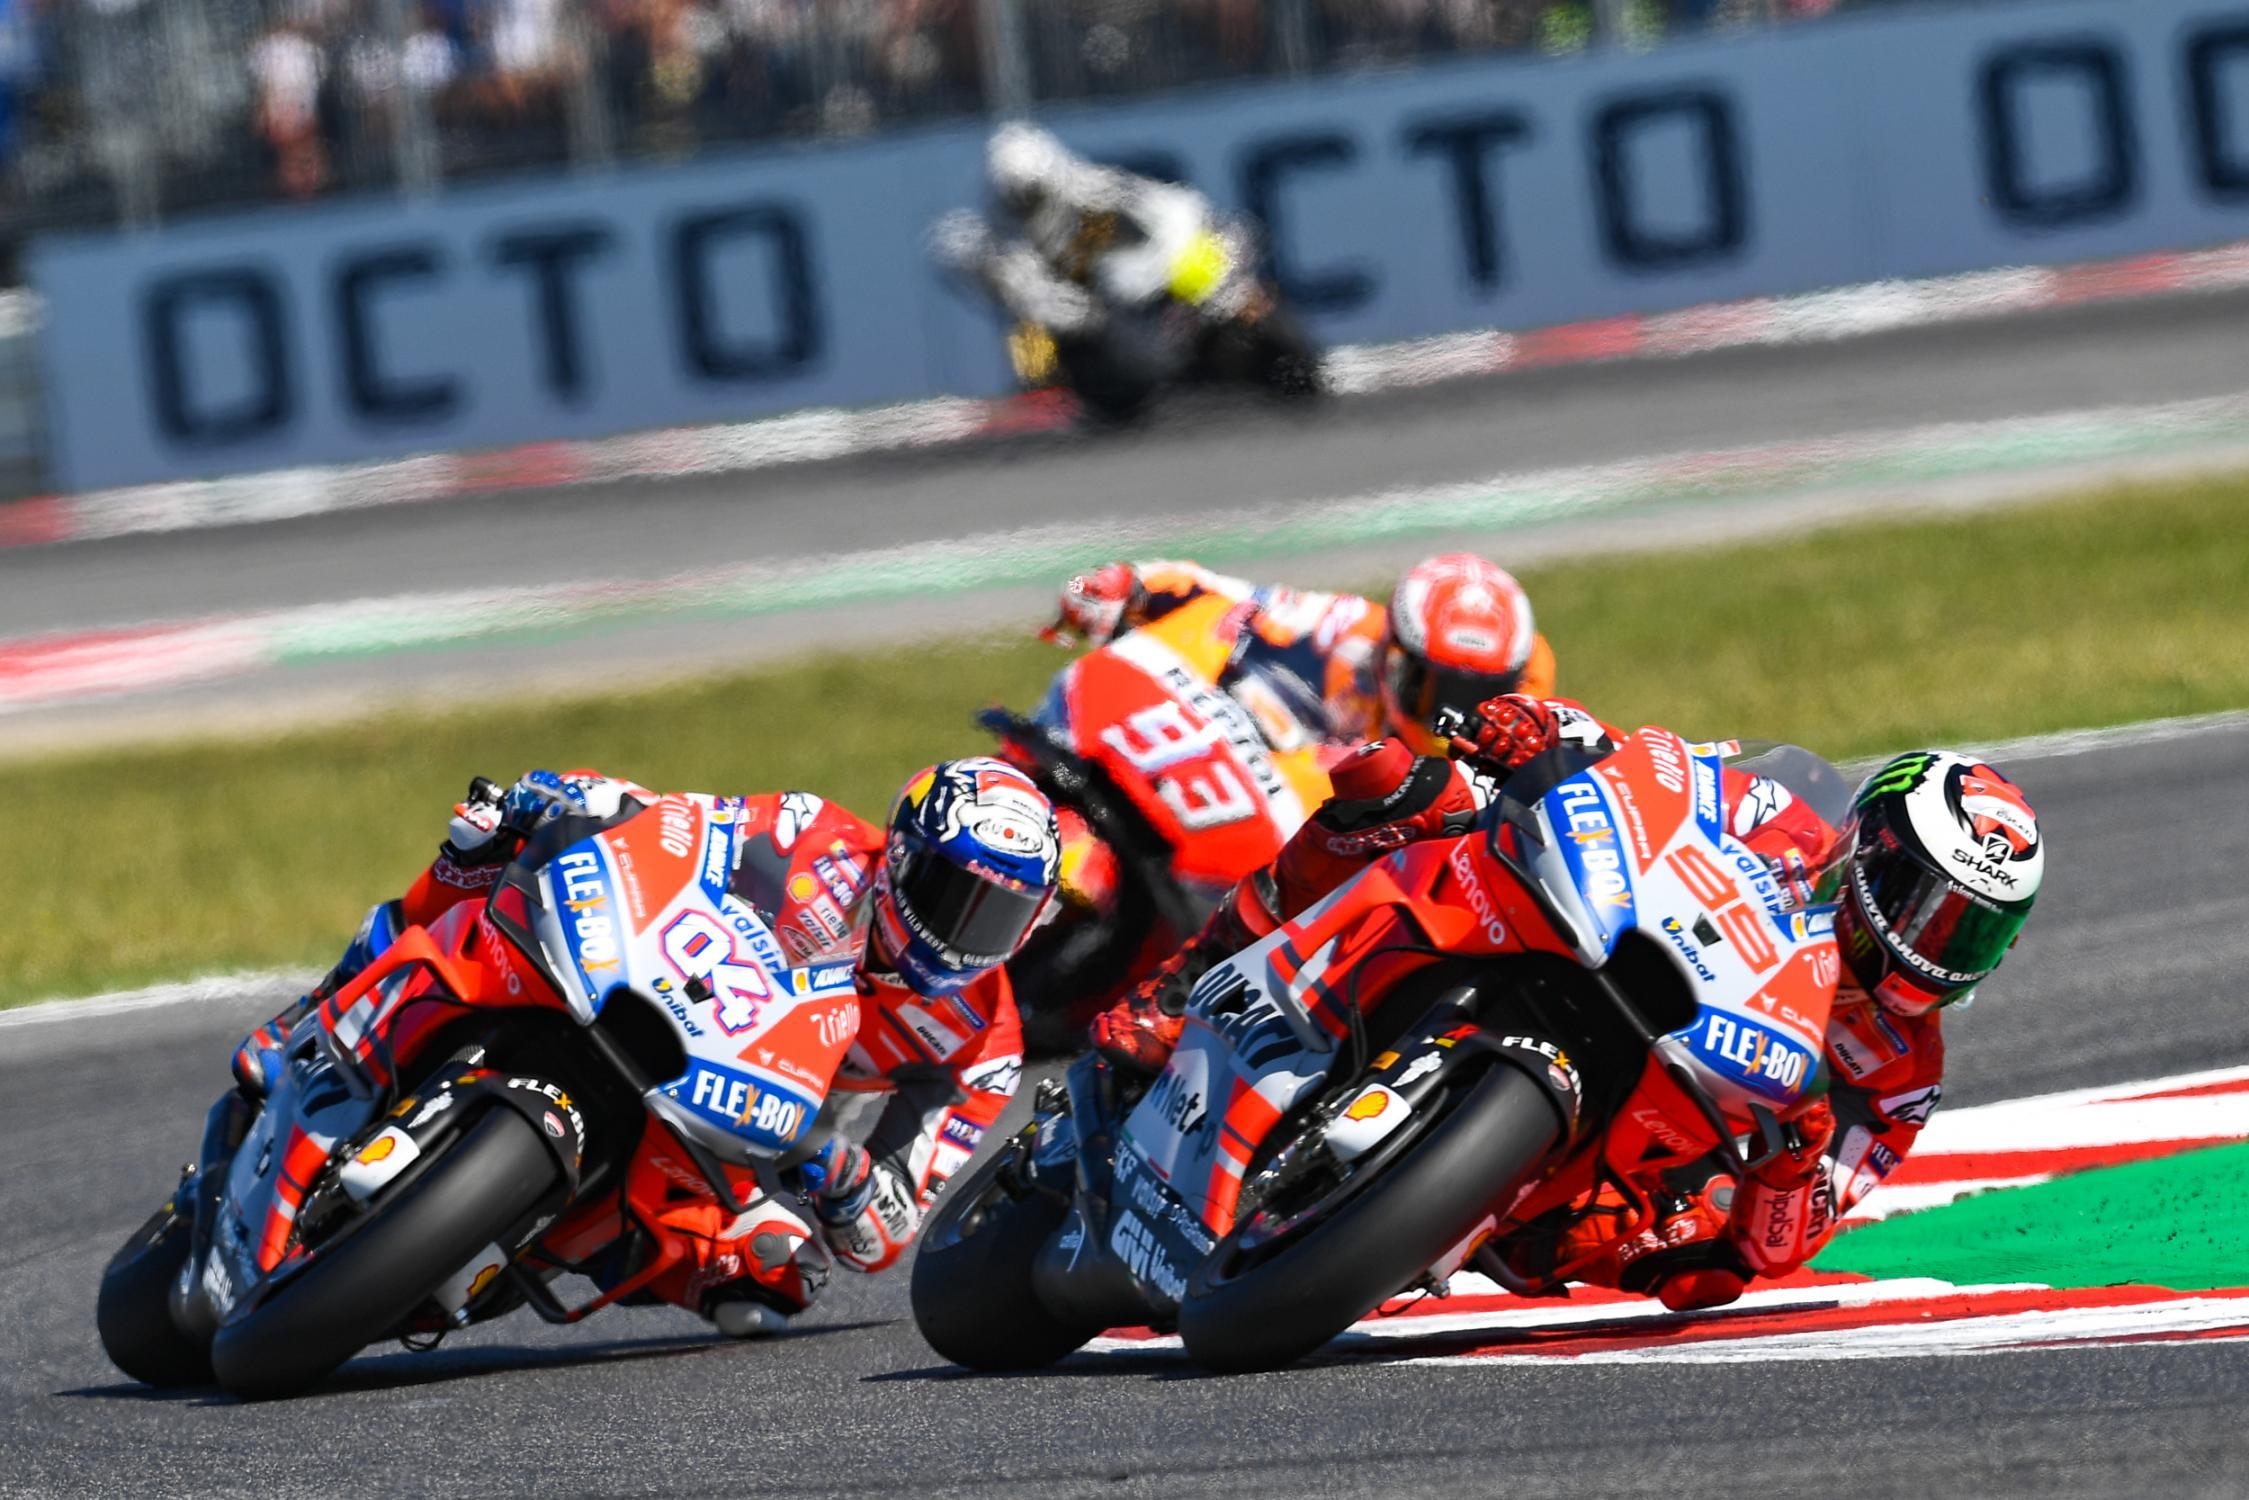 MotoGP Misano 2018 – San Marino Mastery from Ducati!